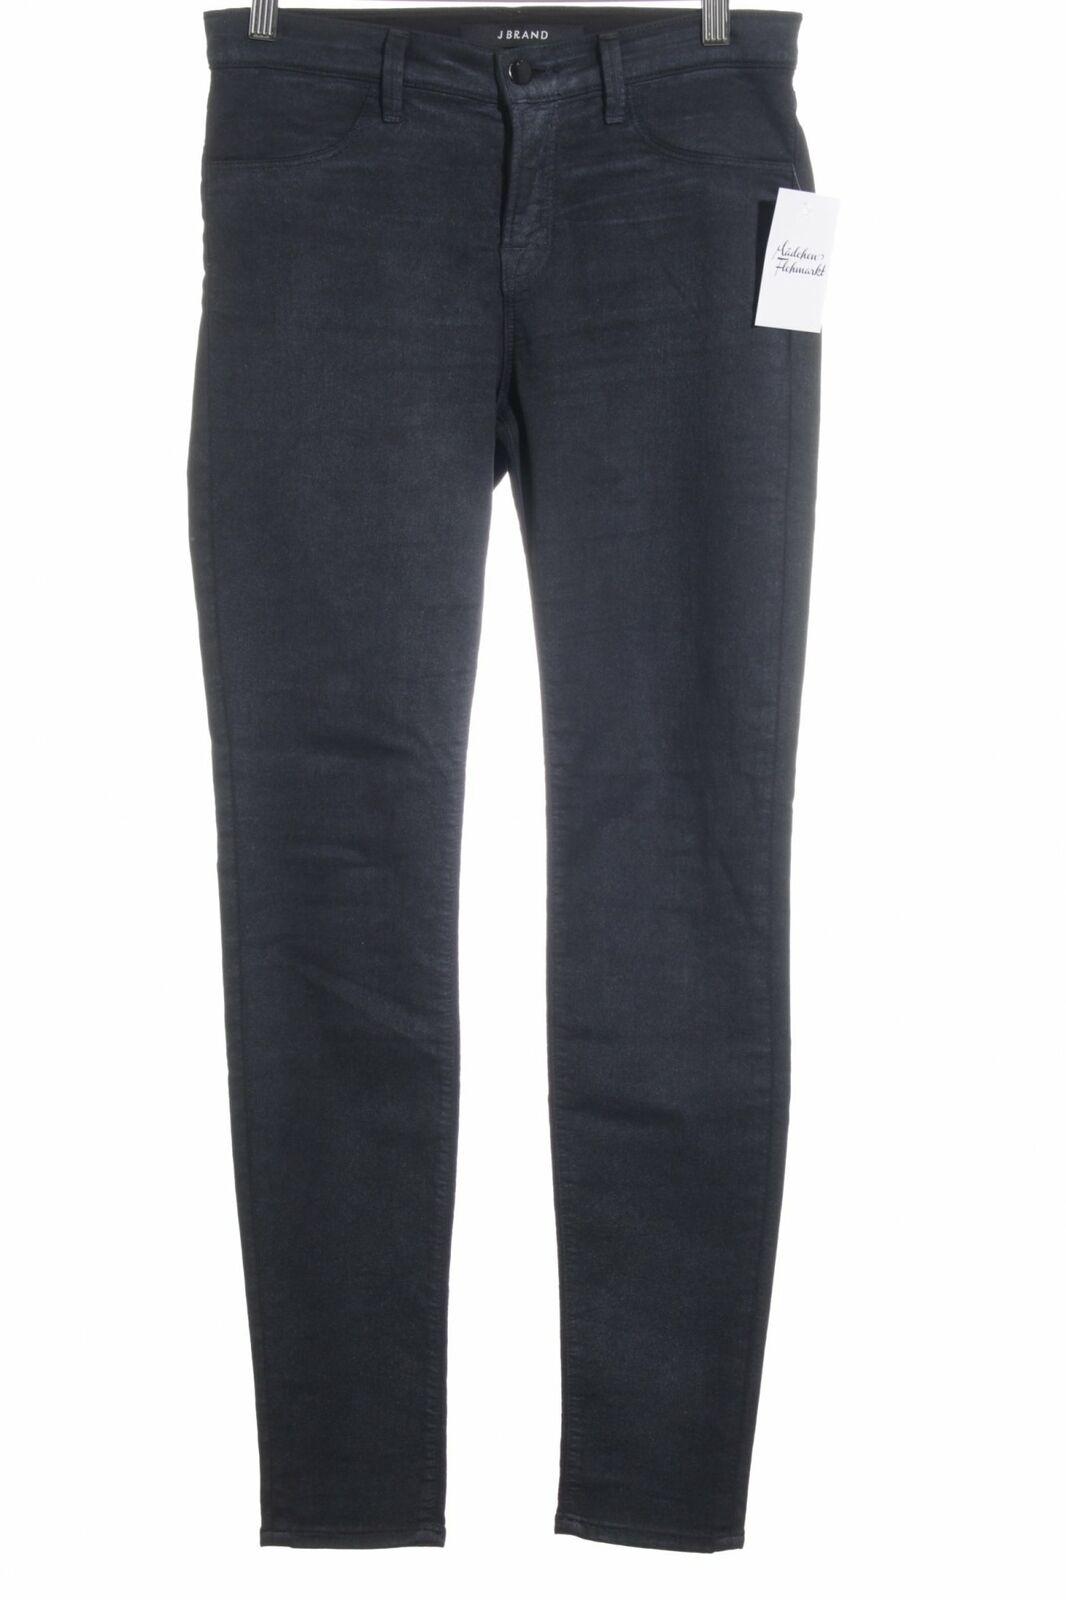 d0a48f1931 JBRAND Jeans A Sigaretta Sigaretta Sigaretta Nero-Blu Scuro conciliatore  Stile Da Donna Tg. de 36 Jeans f7d54b